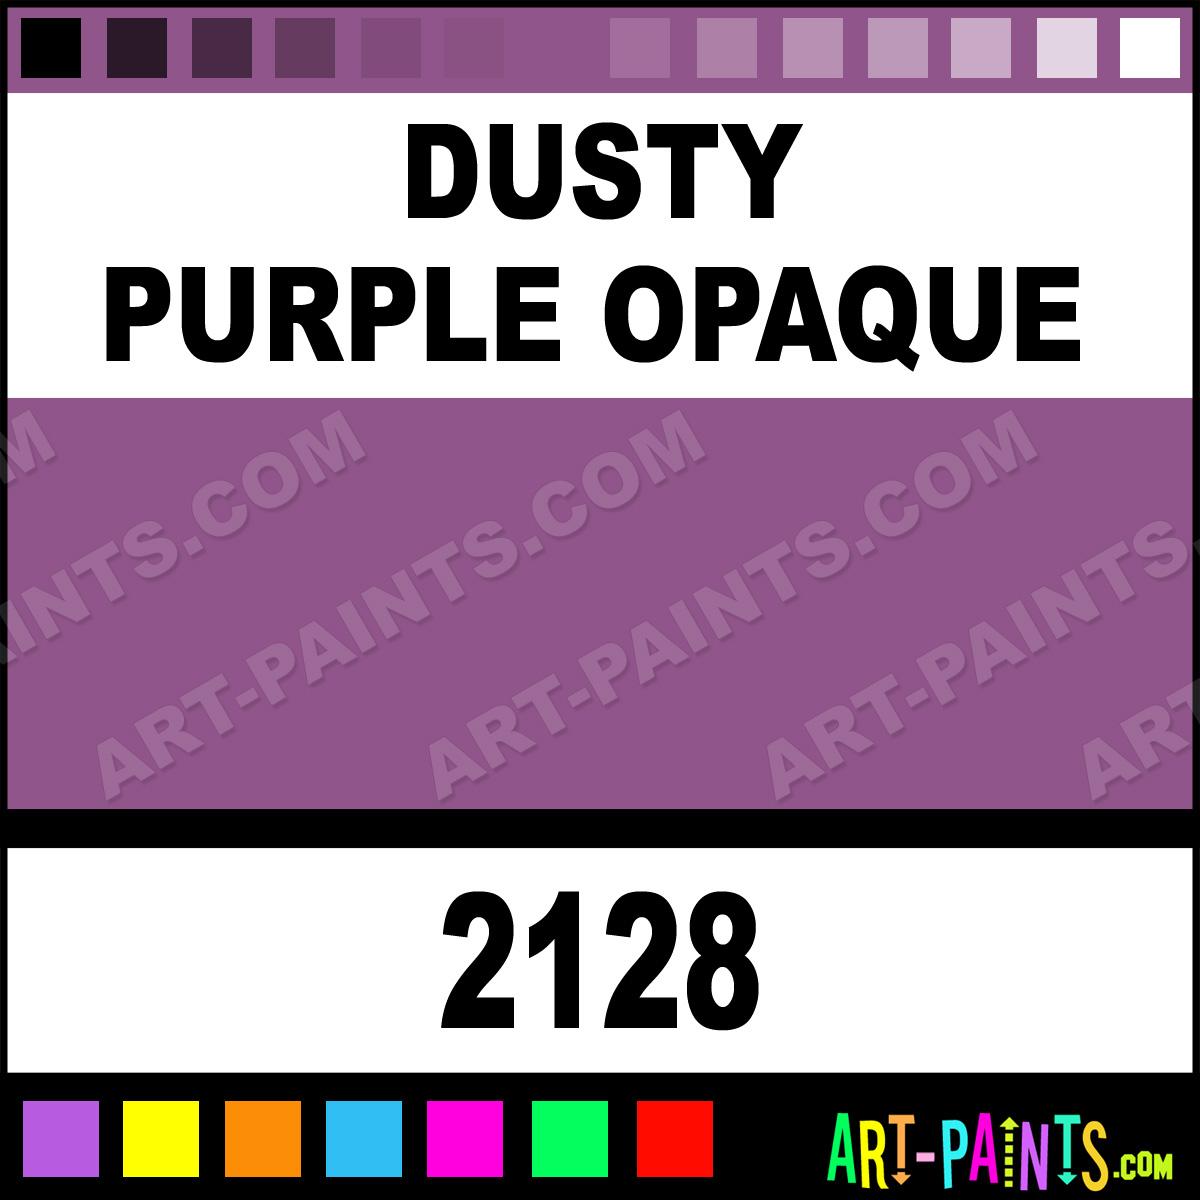 Dusty purple opaque delta acrylic paints 2128 dusty purple dusty purple opaque paint 2128 by ceramcoat delta paints nvjuhfo Choice Image